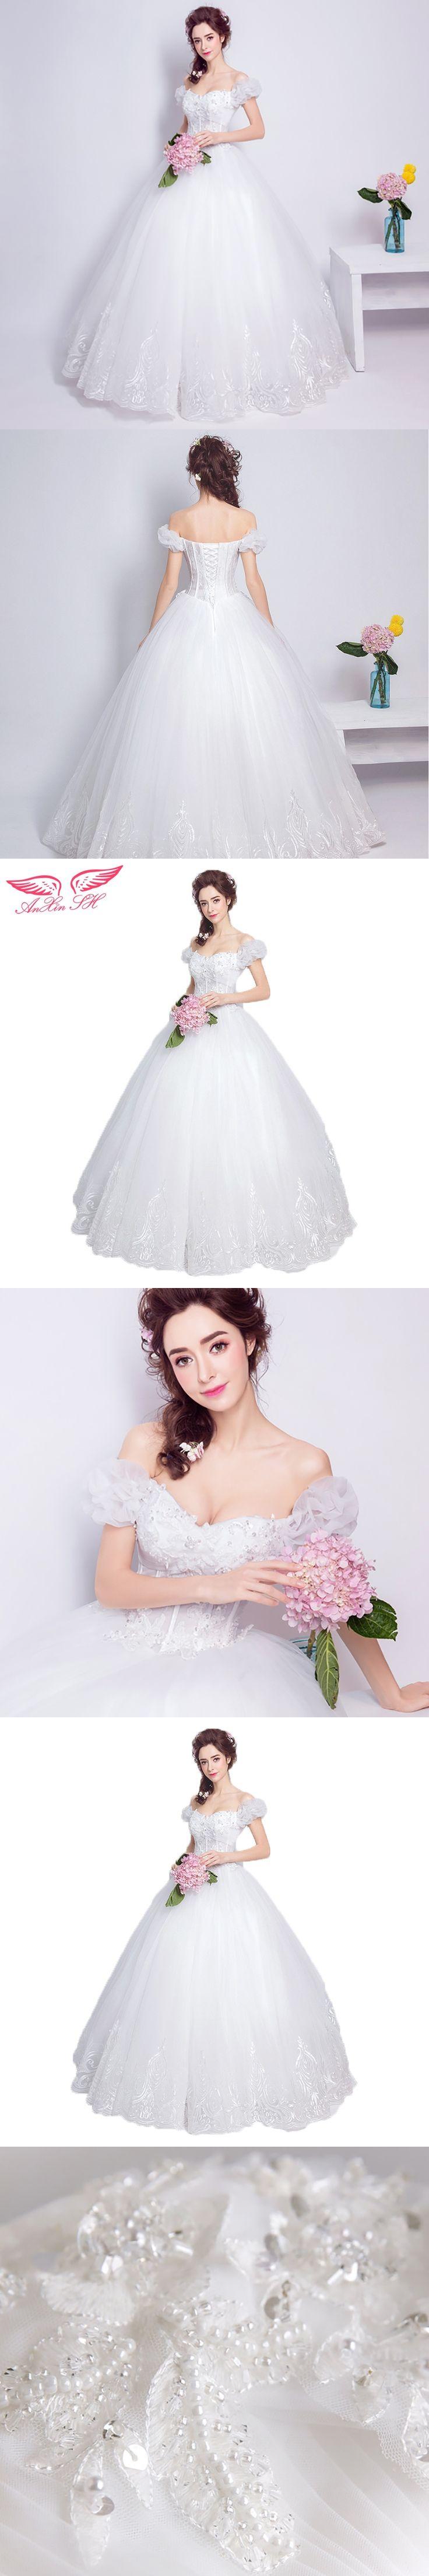 AnXin SH Sweet bubble sleeve wedding dress sexy suction eye right shoulder palace princess wedding dress 5966